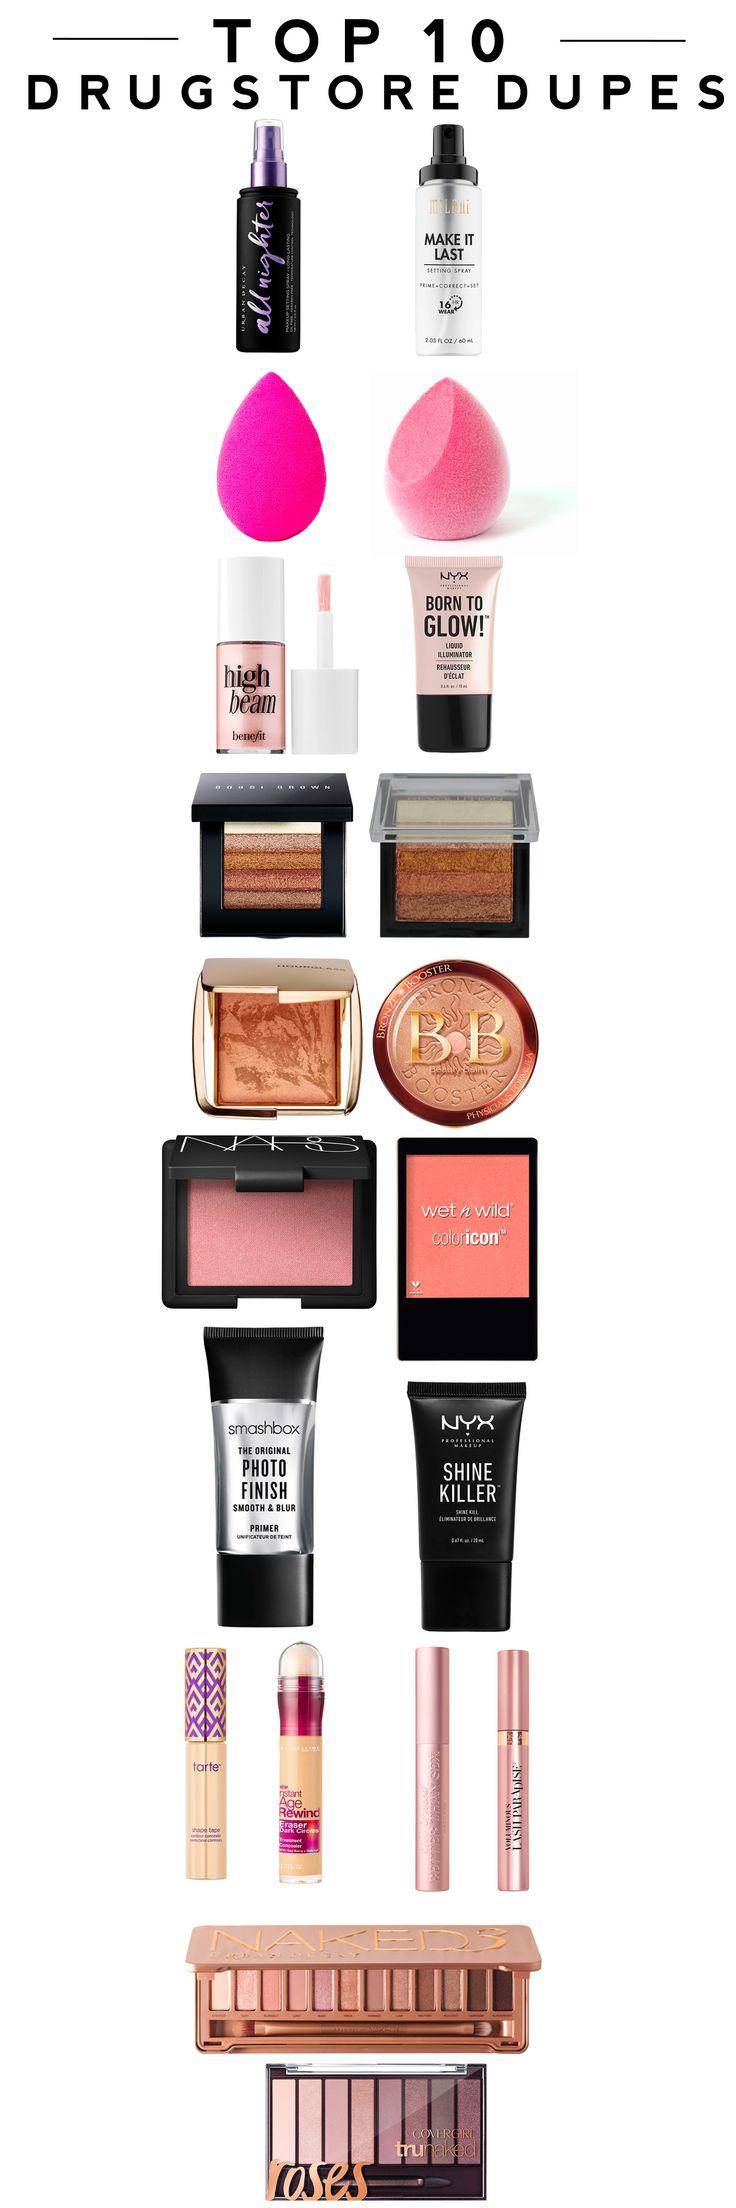 Top 10 Drugstore Makeup Dupes